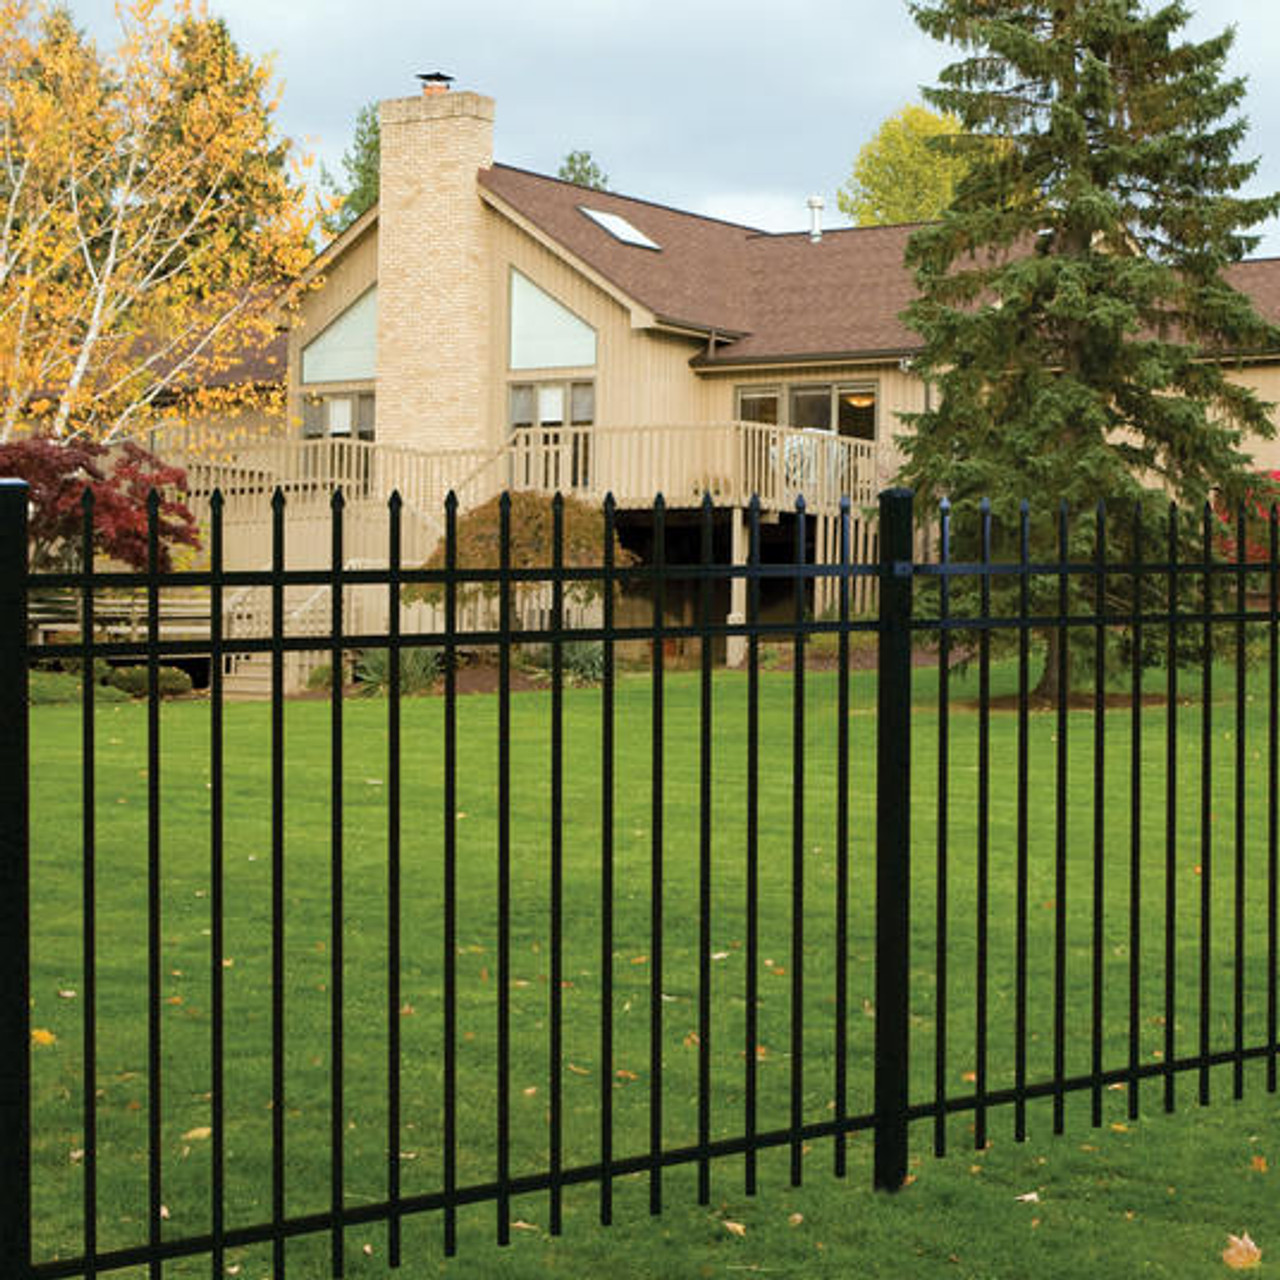 Regis 3131 Spear Top Ornamental Aluminum Fence Sections